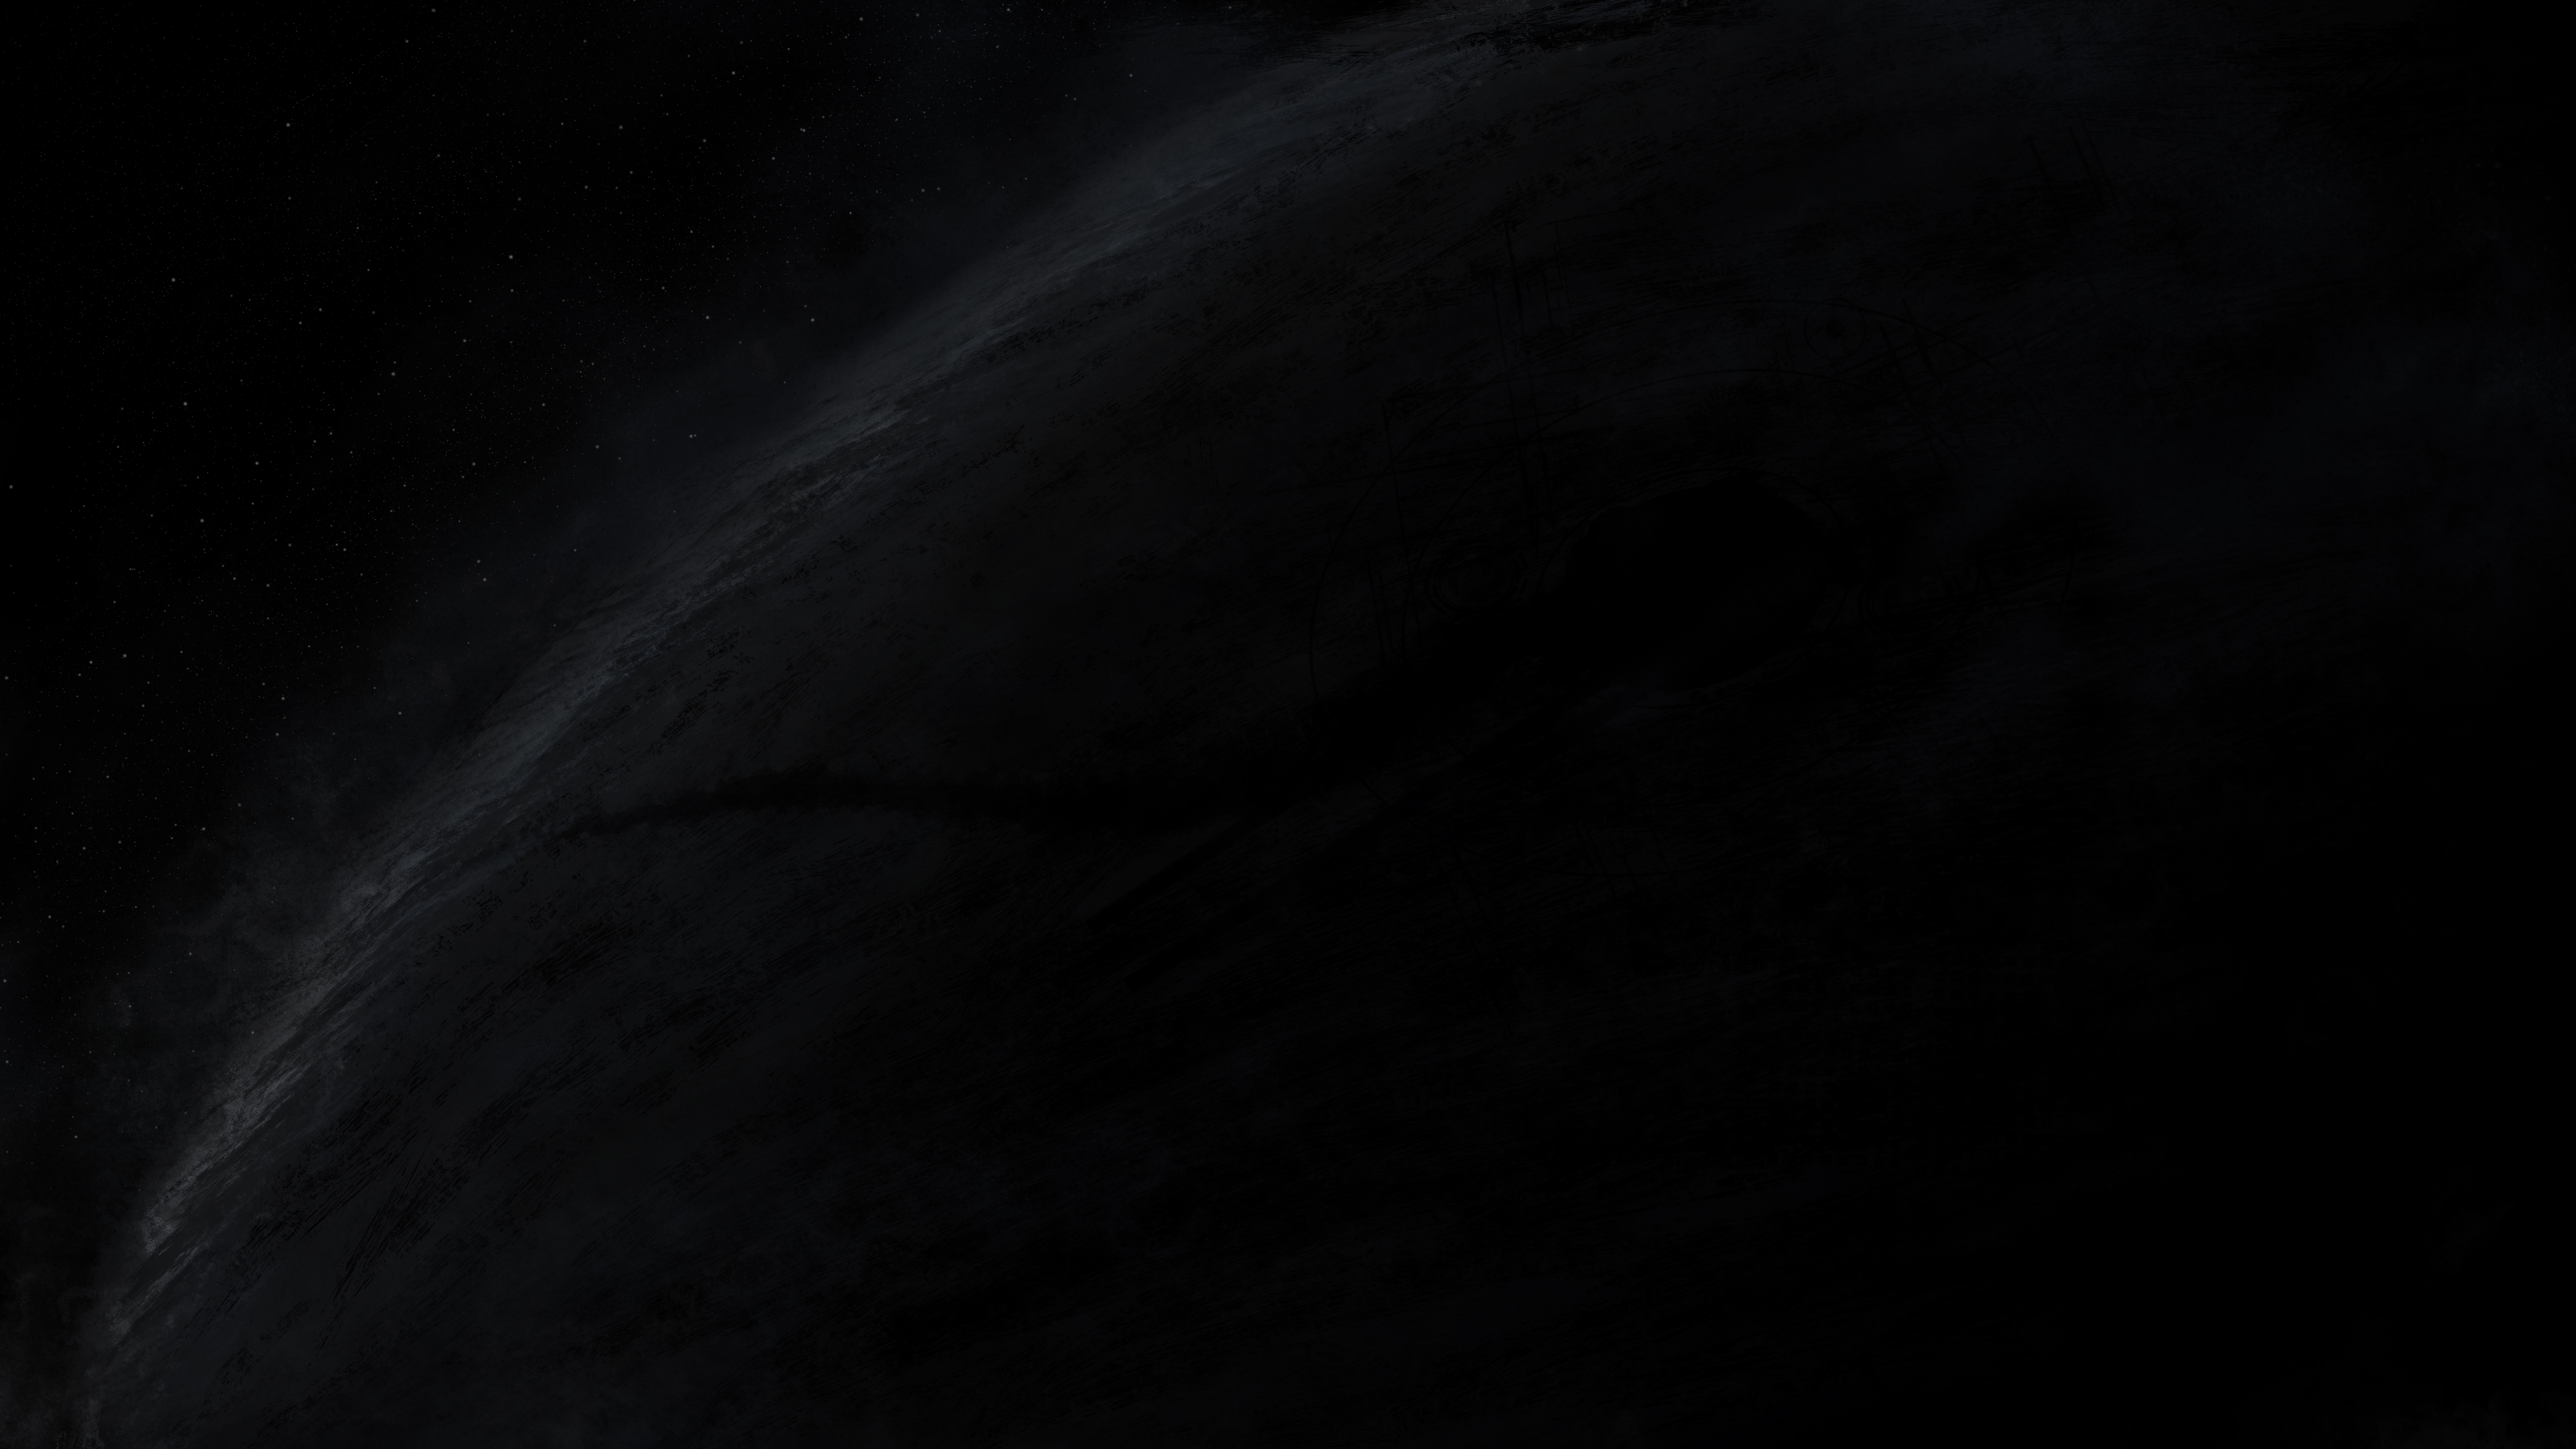 7680x4320 Dark Black Simple Background 8k 8k Hd 4k